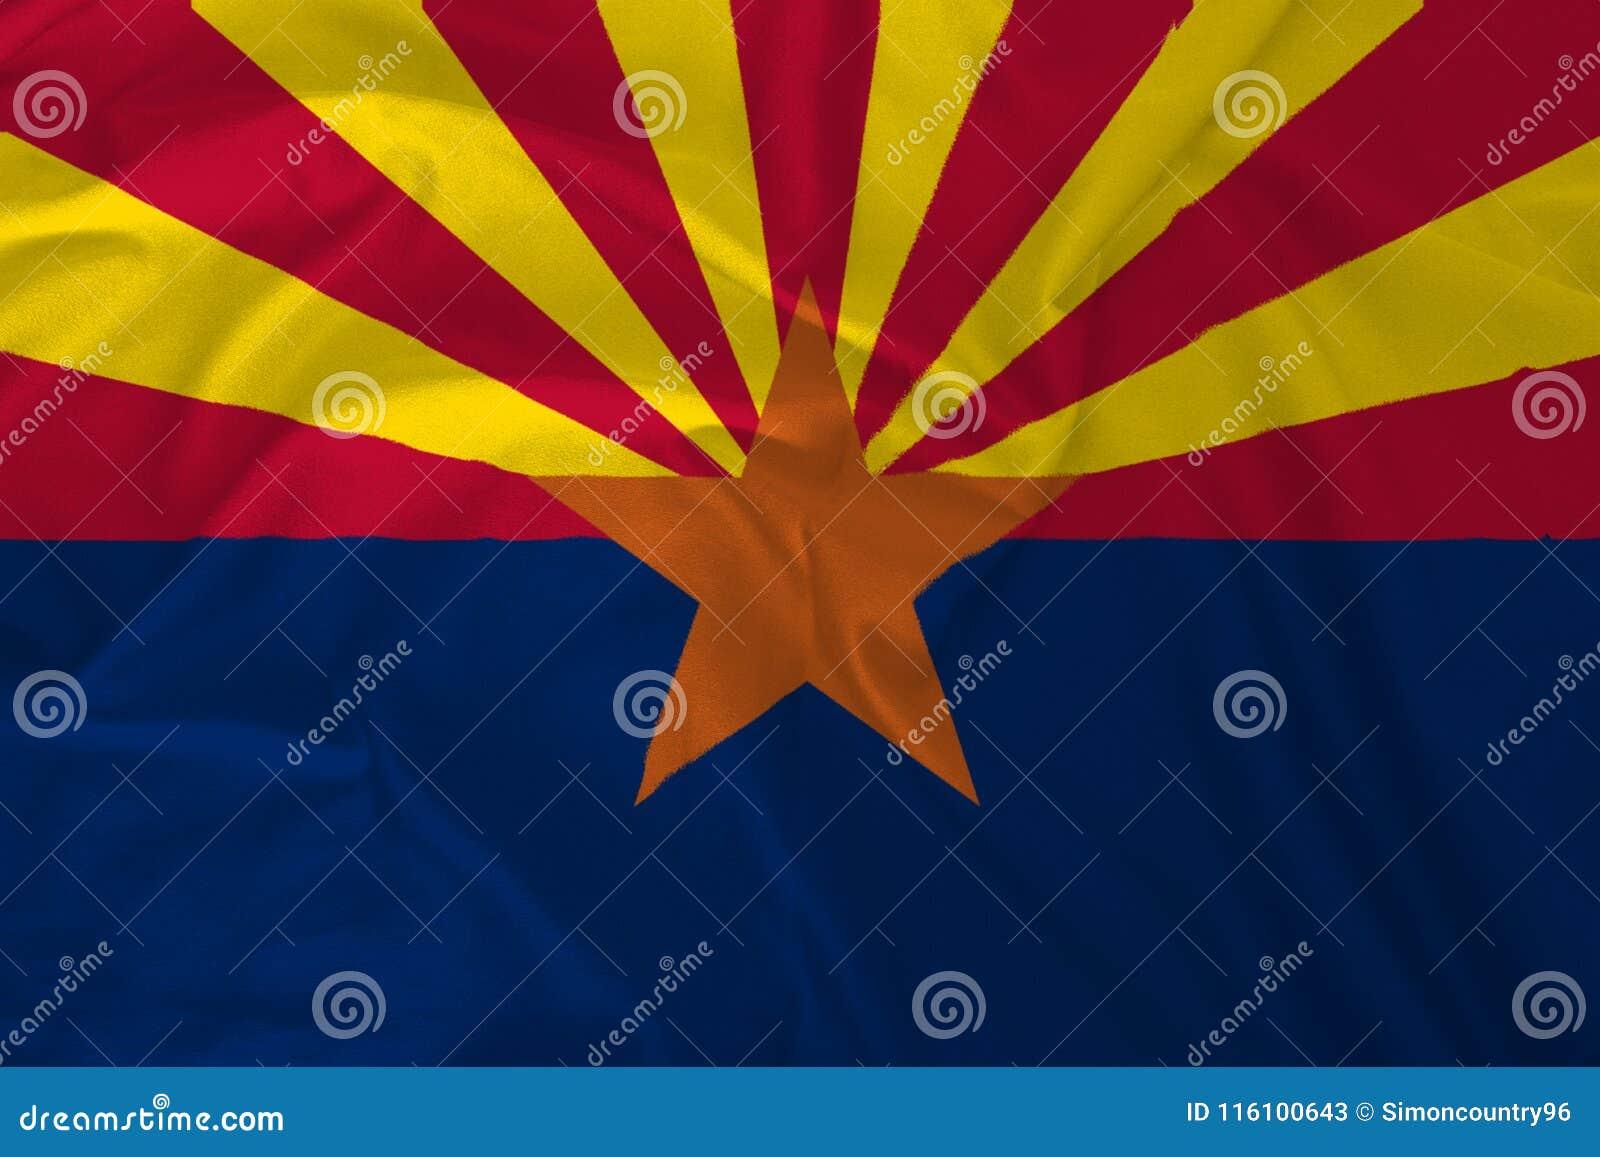 Bandera de Arizona Backgroud, el estado de Grand Canyon